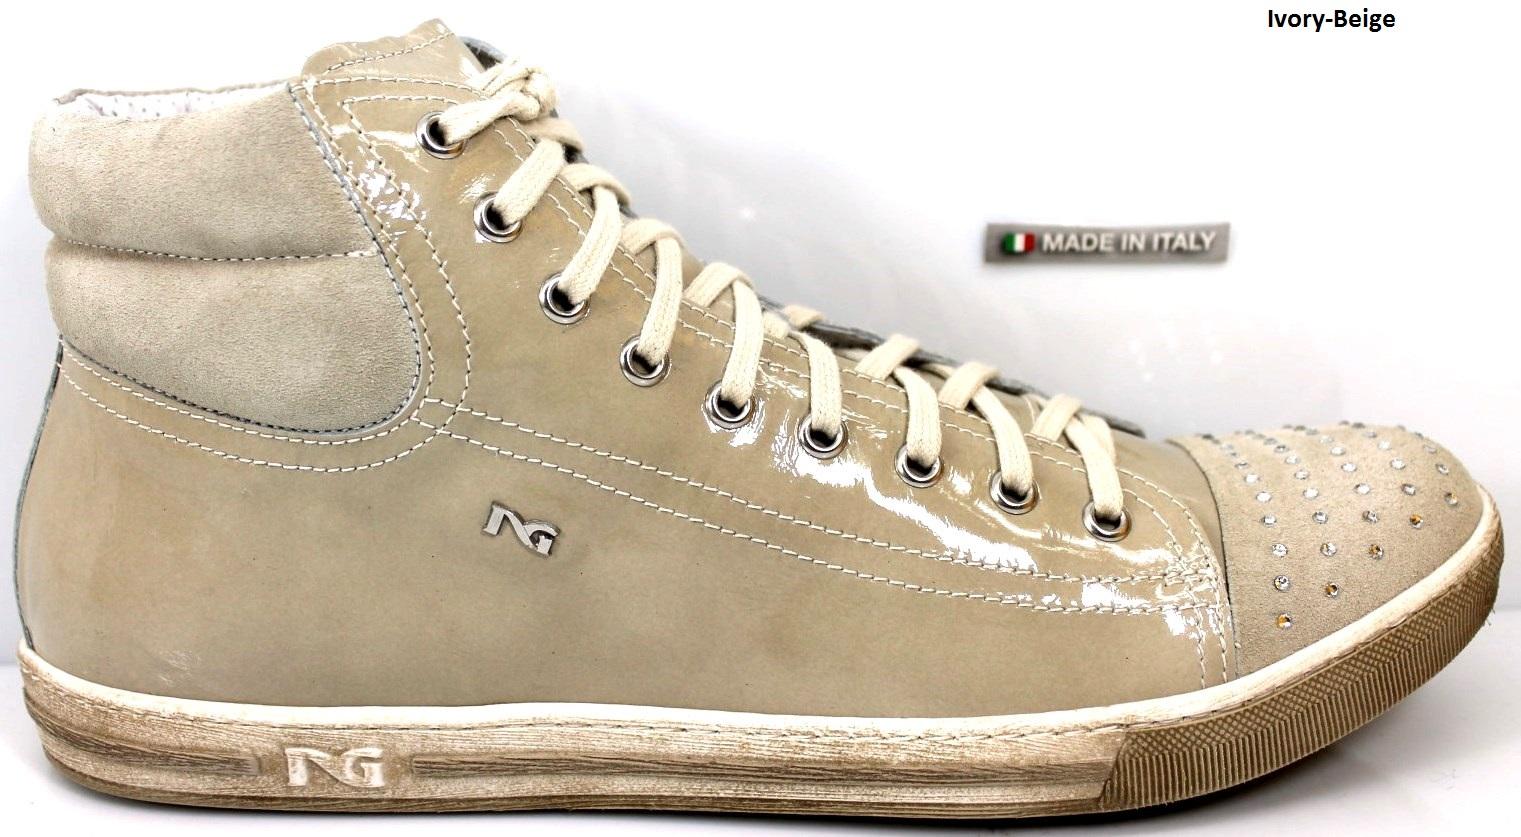 Woman Sneakers NERO GIARDINI Scarpe Donna Calzature Woman Shoes 2 2 di 5 ... f2af8b8a55a